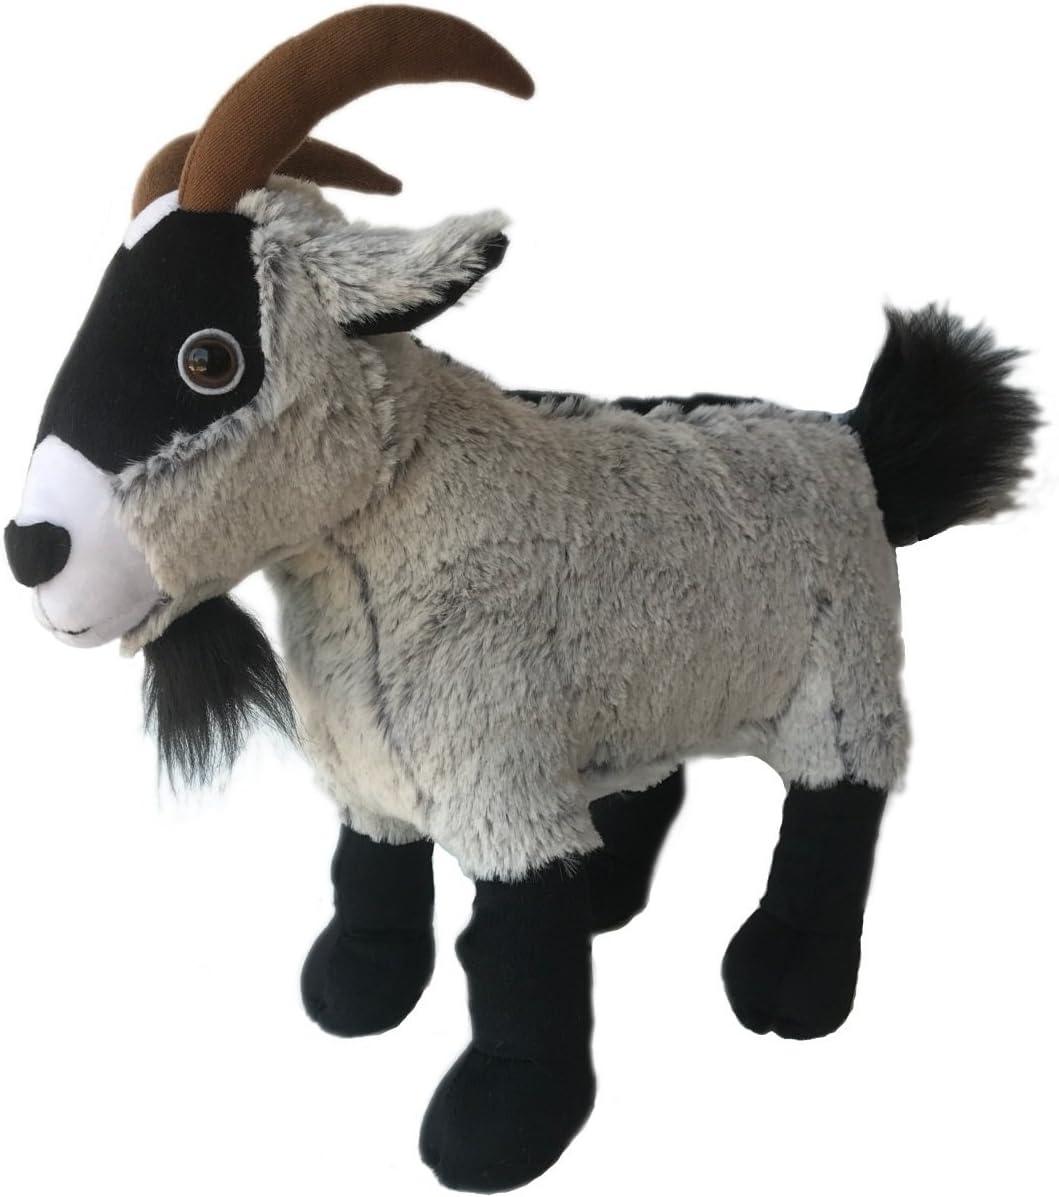 Realistic Gray Goat Soft Plush Kids And Children Simulation Stuffed Cuddly Toy